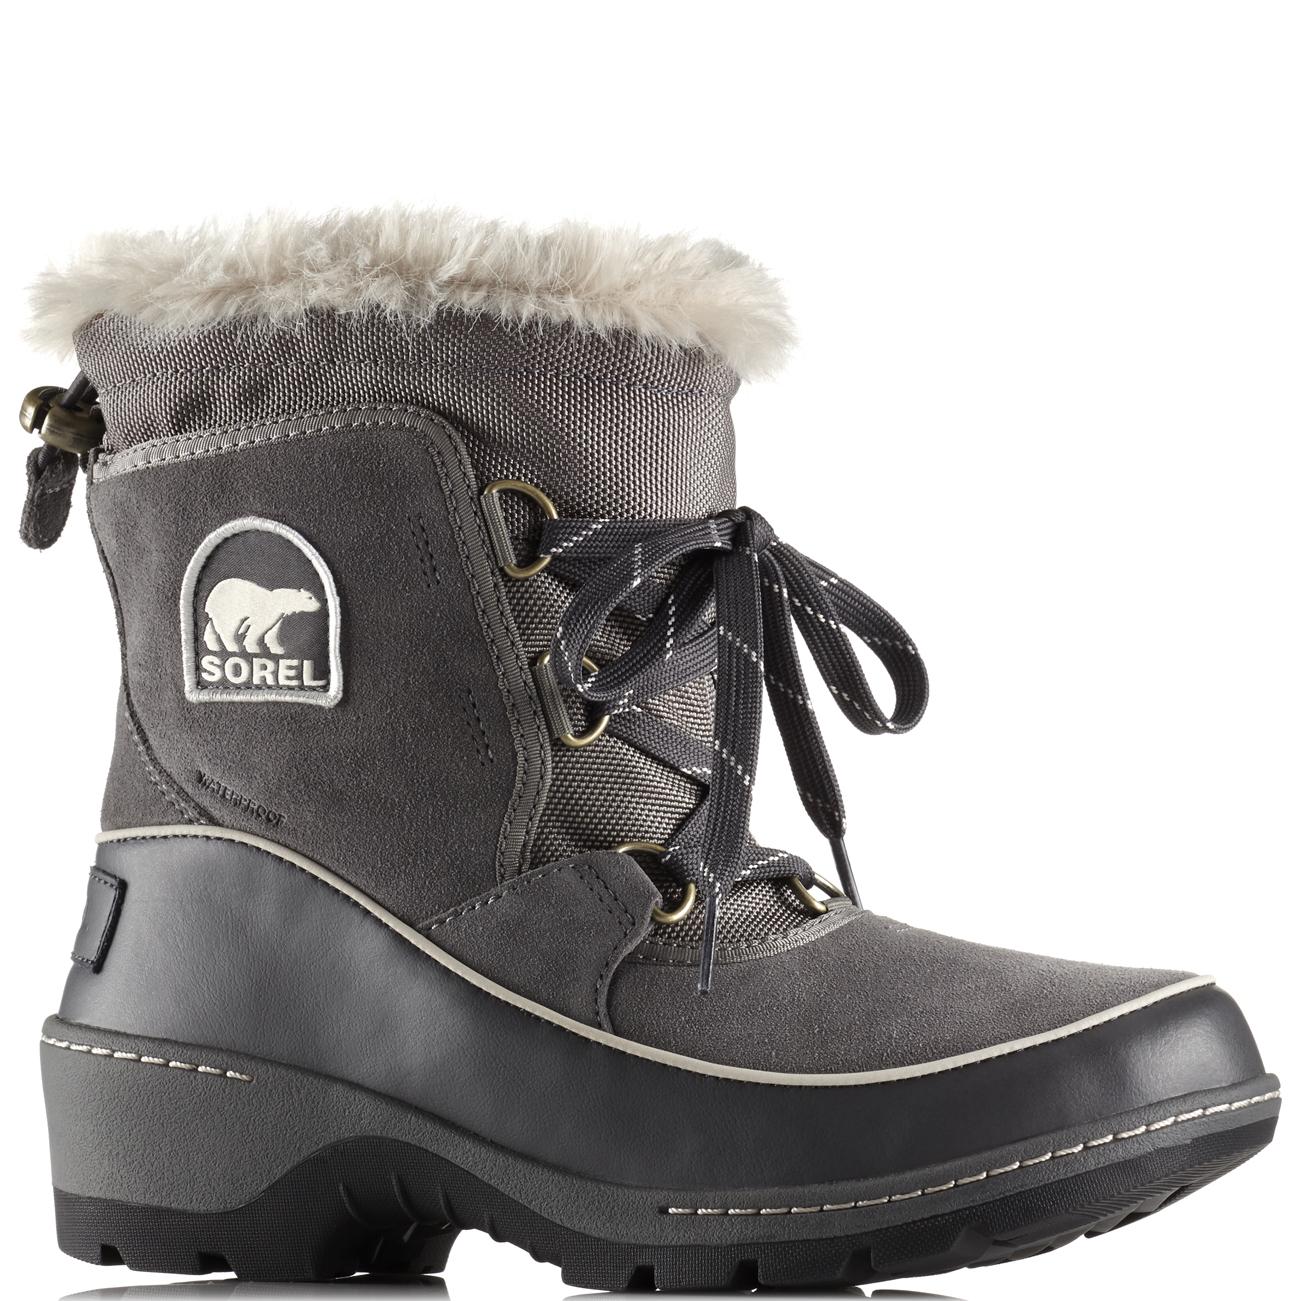 Descuento de la marca Nieve Impermeable Invierno para Mujer Sorel Torino Torino Sorel Lluvia Senderismo Caminar botín Reino Unido 3-9 805b83